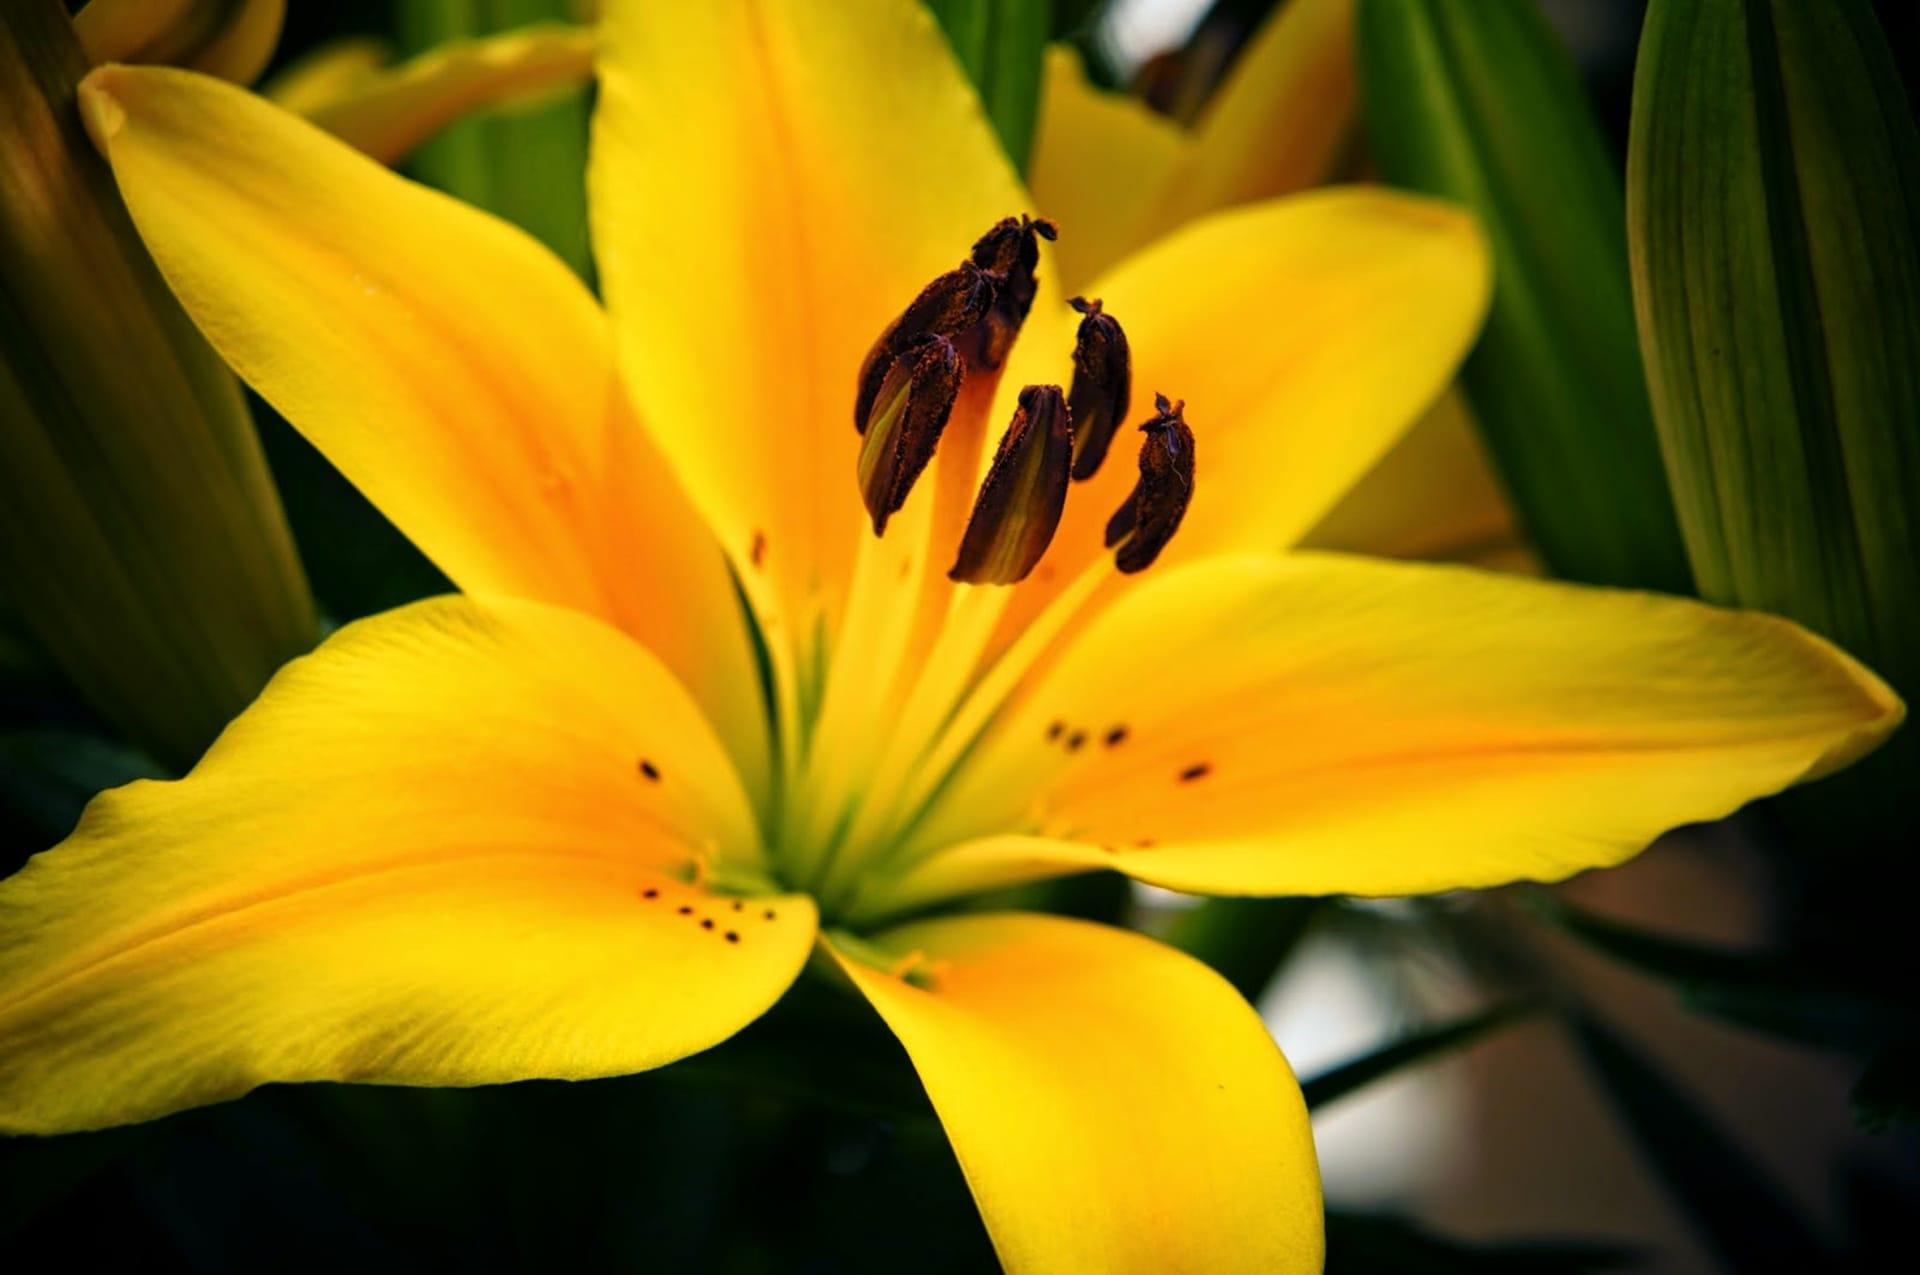 Gratis afbeelding: lelie, stamper, stuifmeel, geel, flora